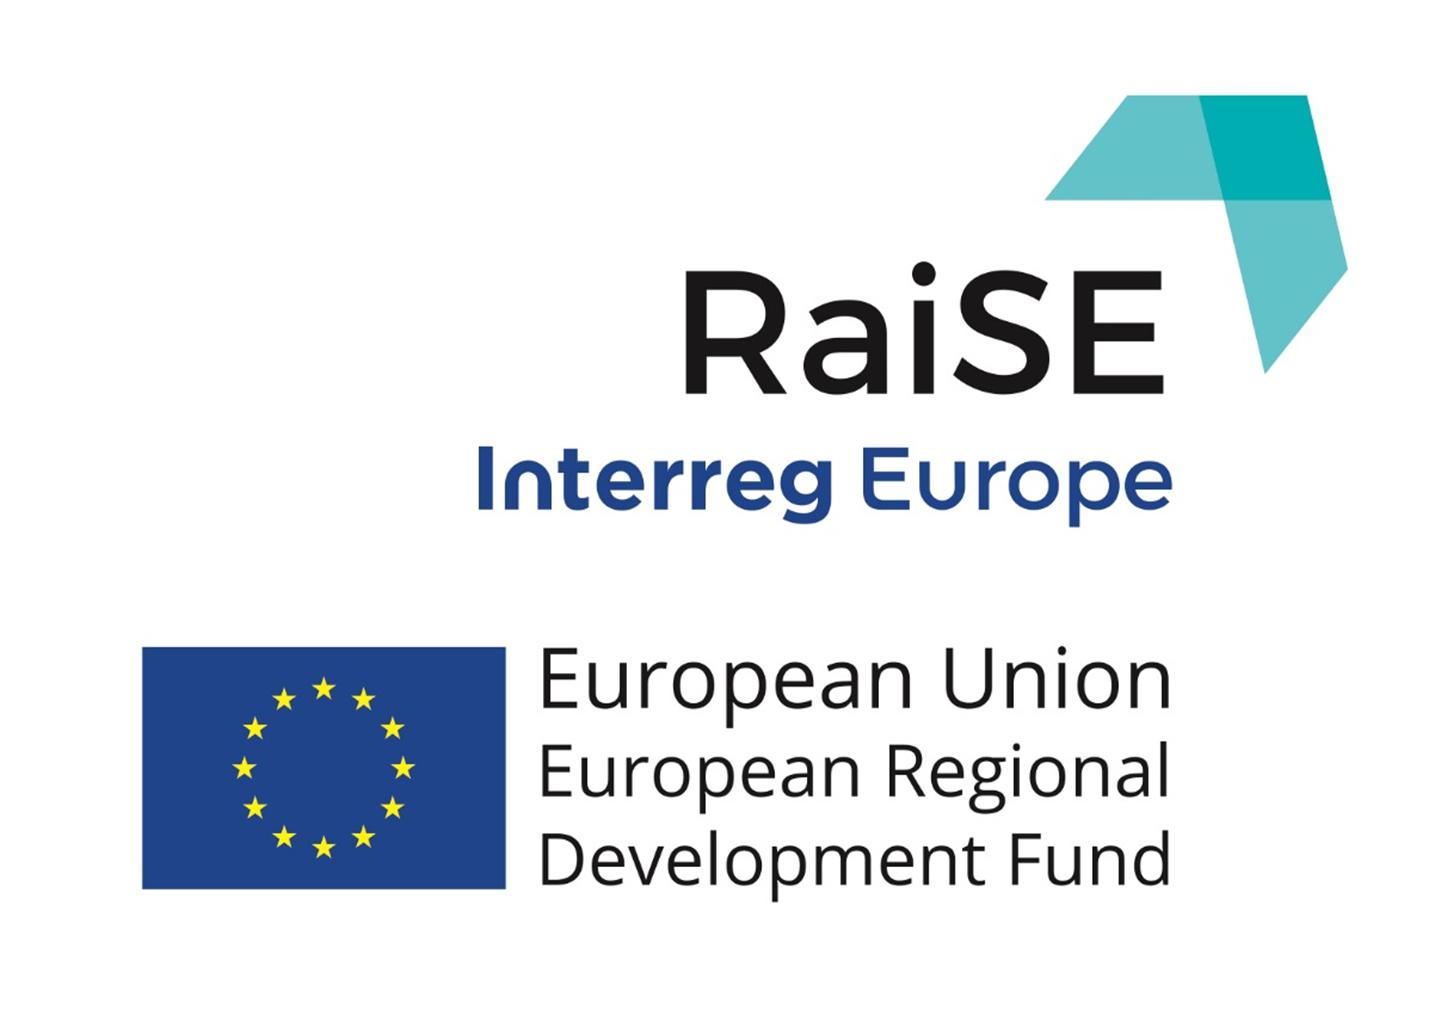 RaiSE Interreg Europe's logotyp